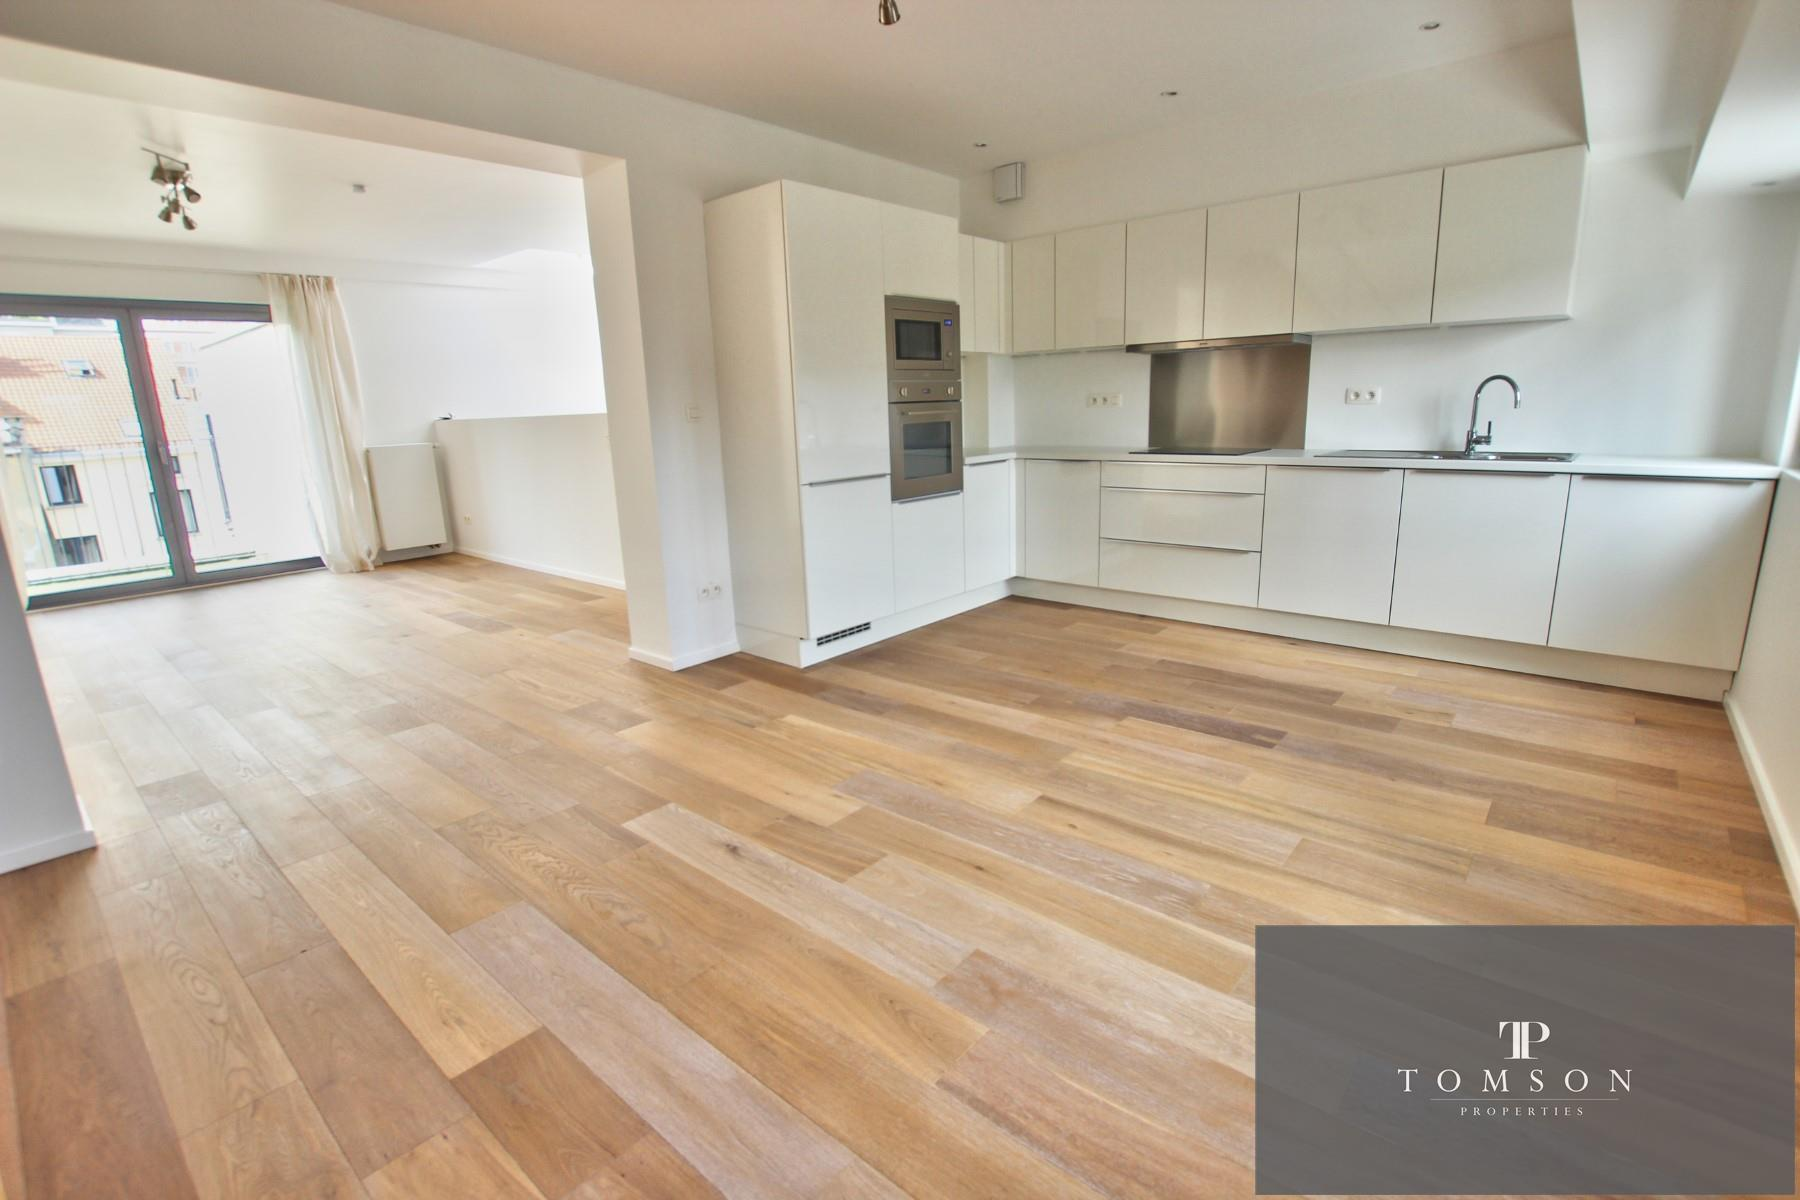 Appartement - Woluwe-Saint-Lambert - #4244113-0